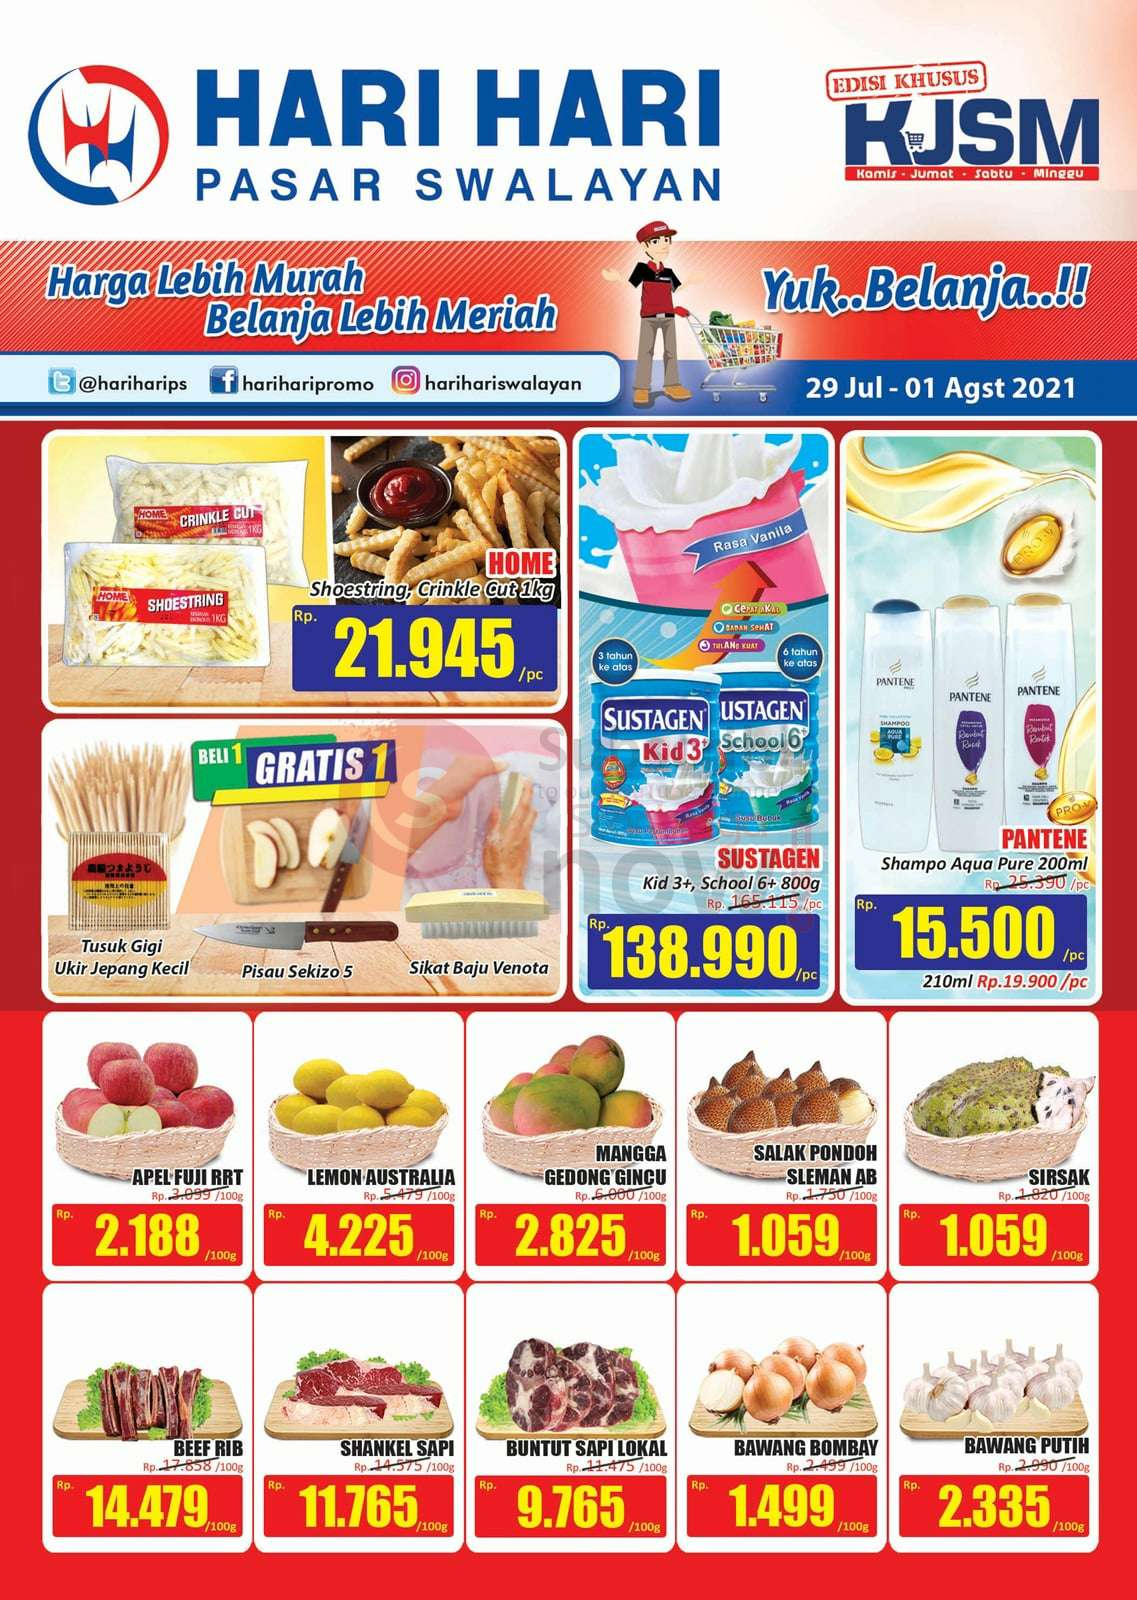 Katalog Promo JSM Hari Hari Swalayan Weekend 29 Juli - 1 Agustus 2021 1